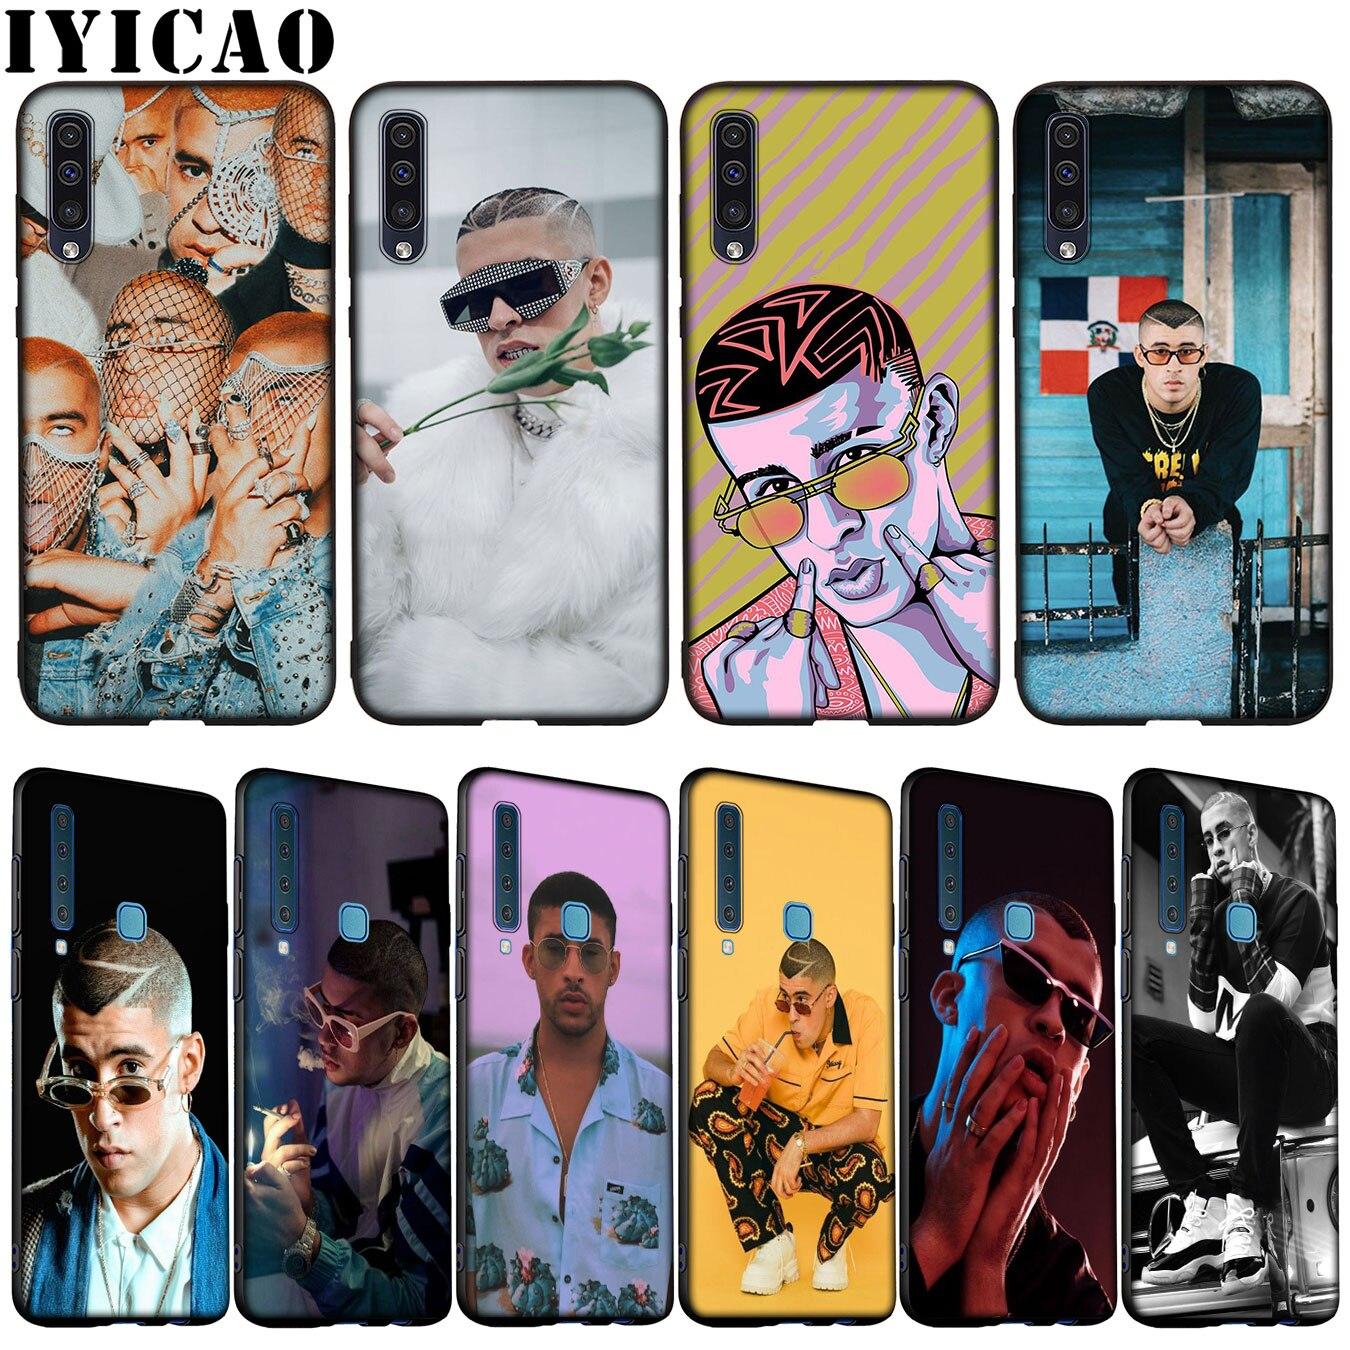 IYICAO mal conejito funda de silicona suave para Samsung Galaxy A70 A60 A50 A40 A30 A20 A10 M10 M20 M30 M40 A20E cubierta